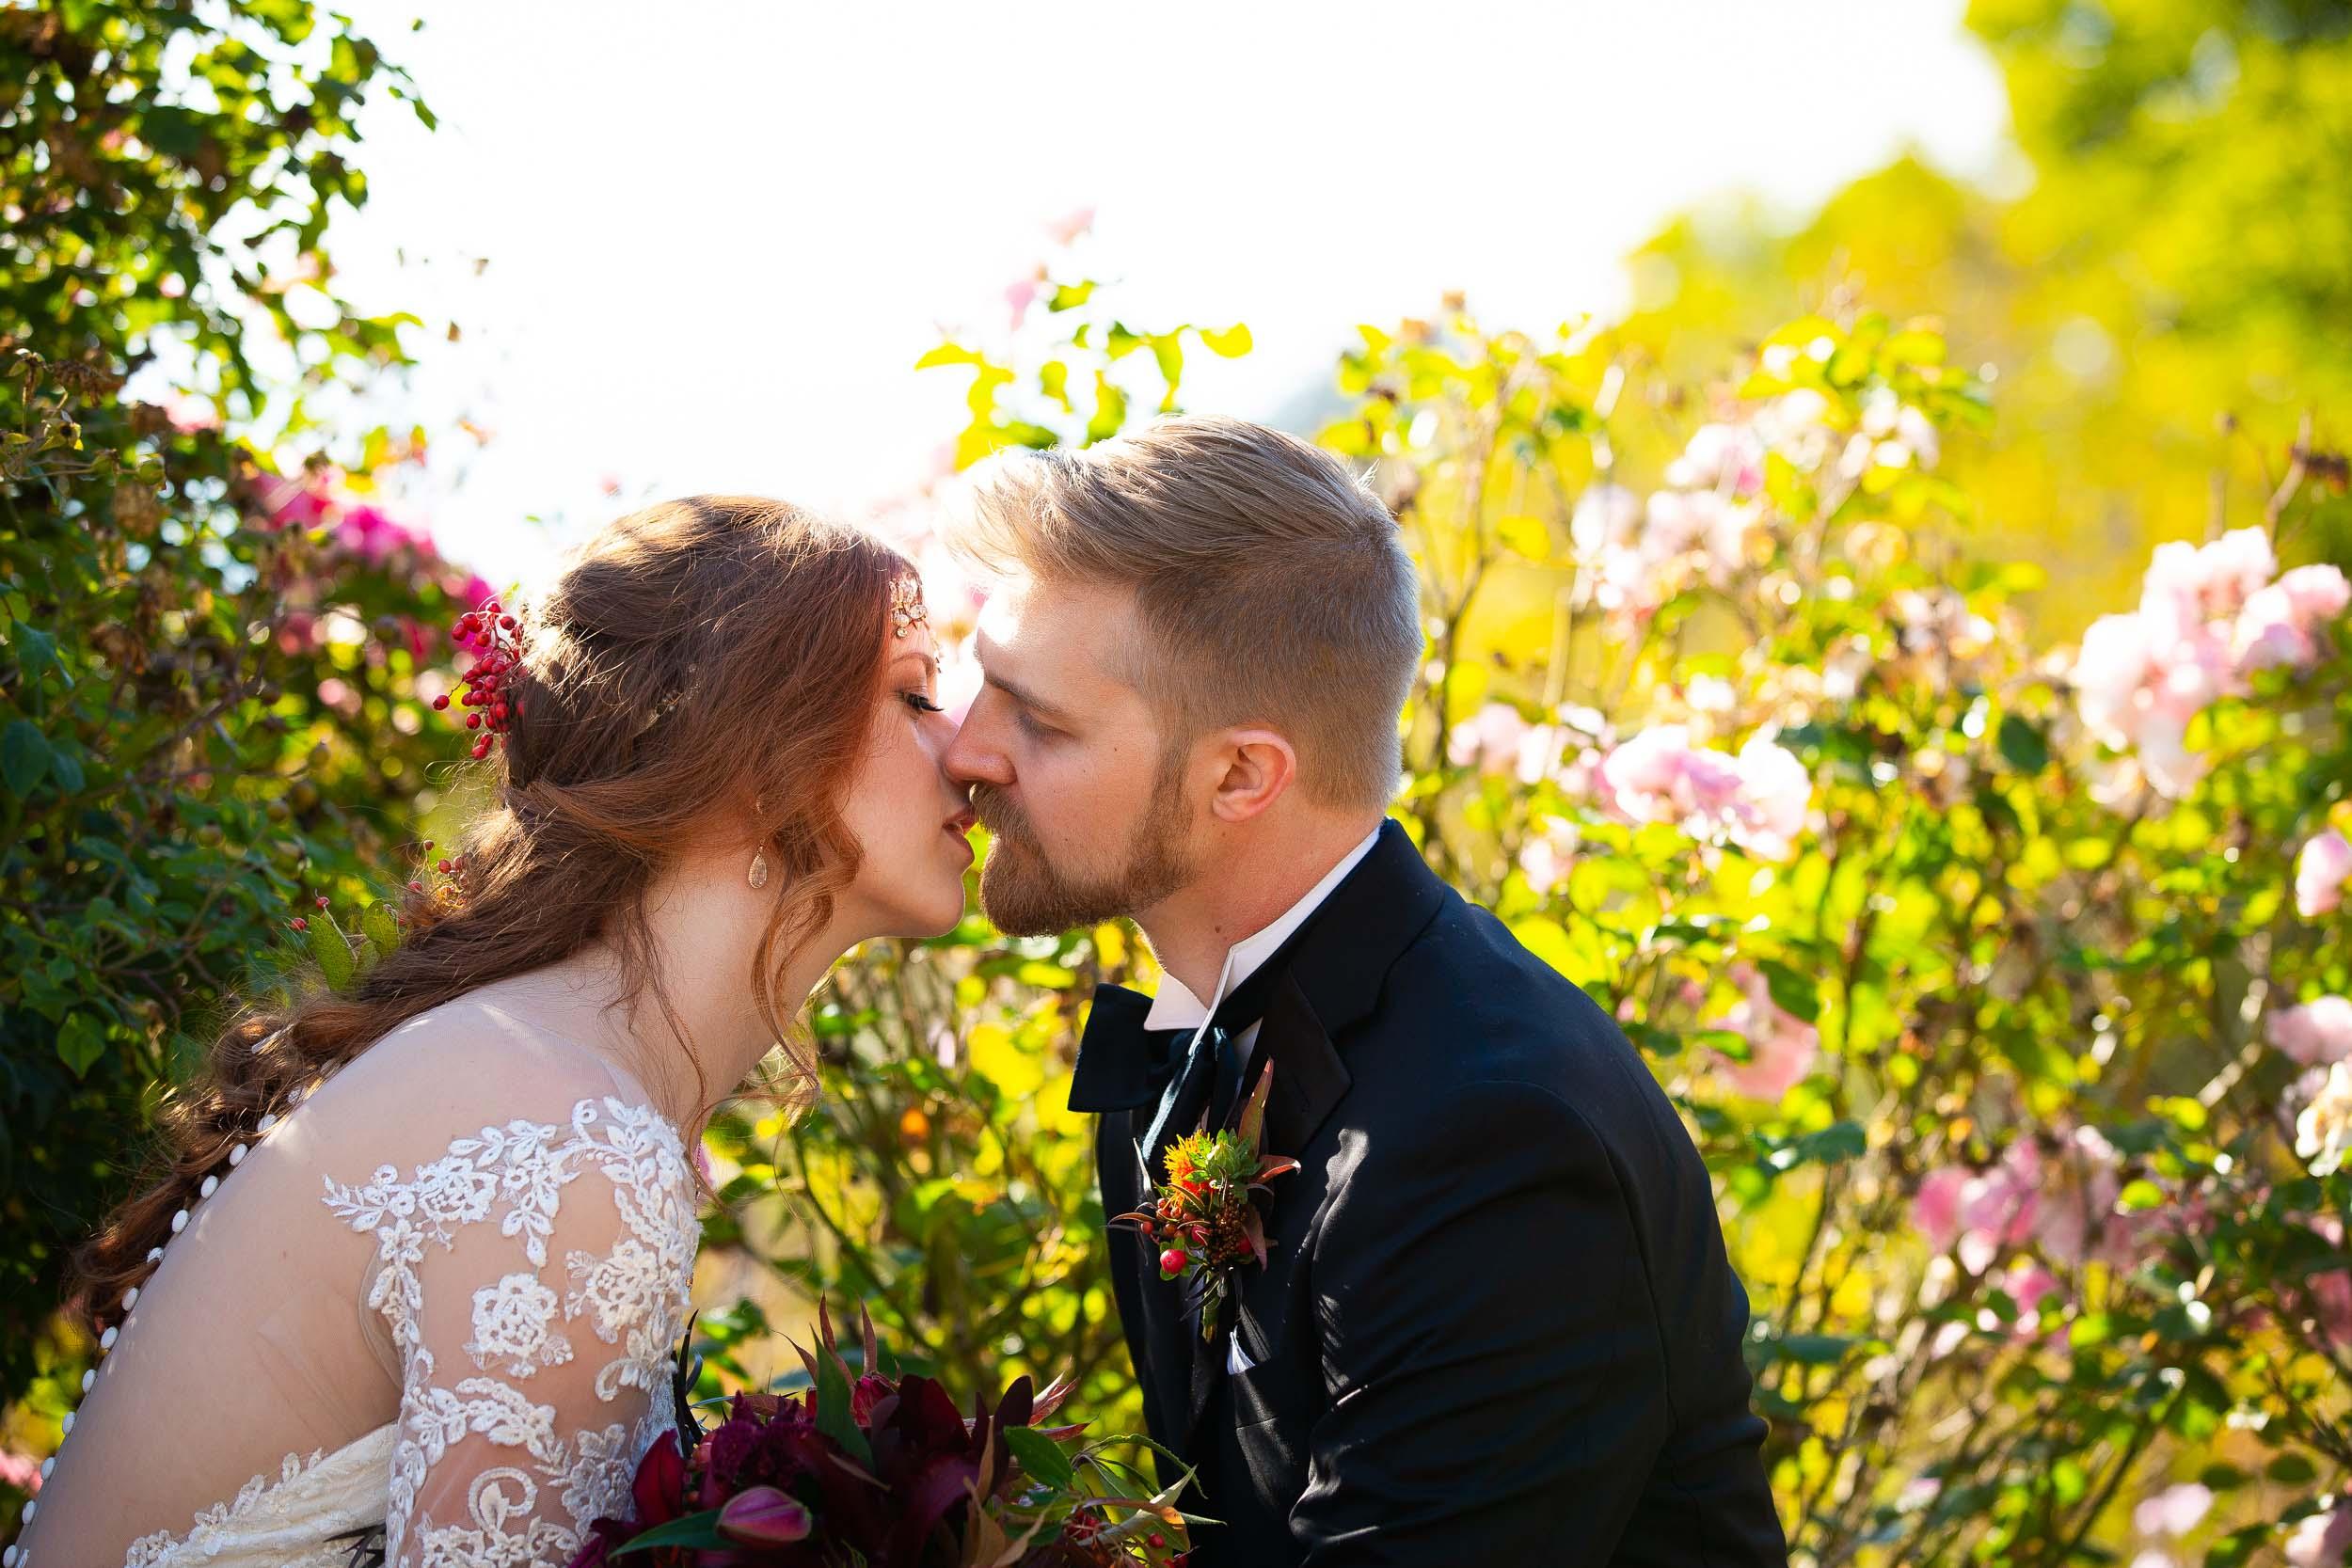 Berkeley Botanical Garden Wedding Ceremony in the Redwood Grove Ceremony and SF Bay Wedding Cruise Reception-59.jpg